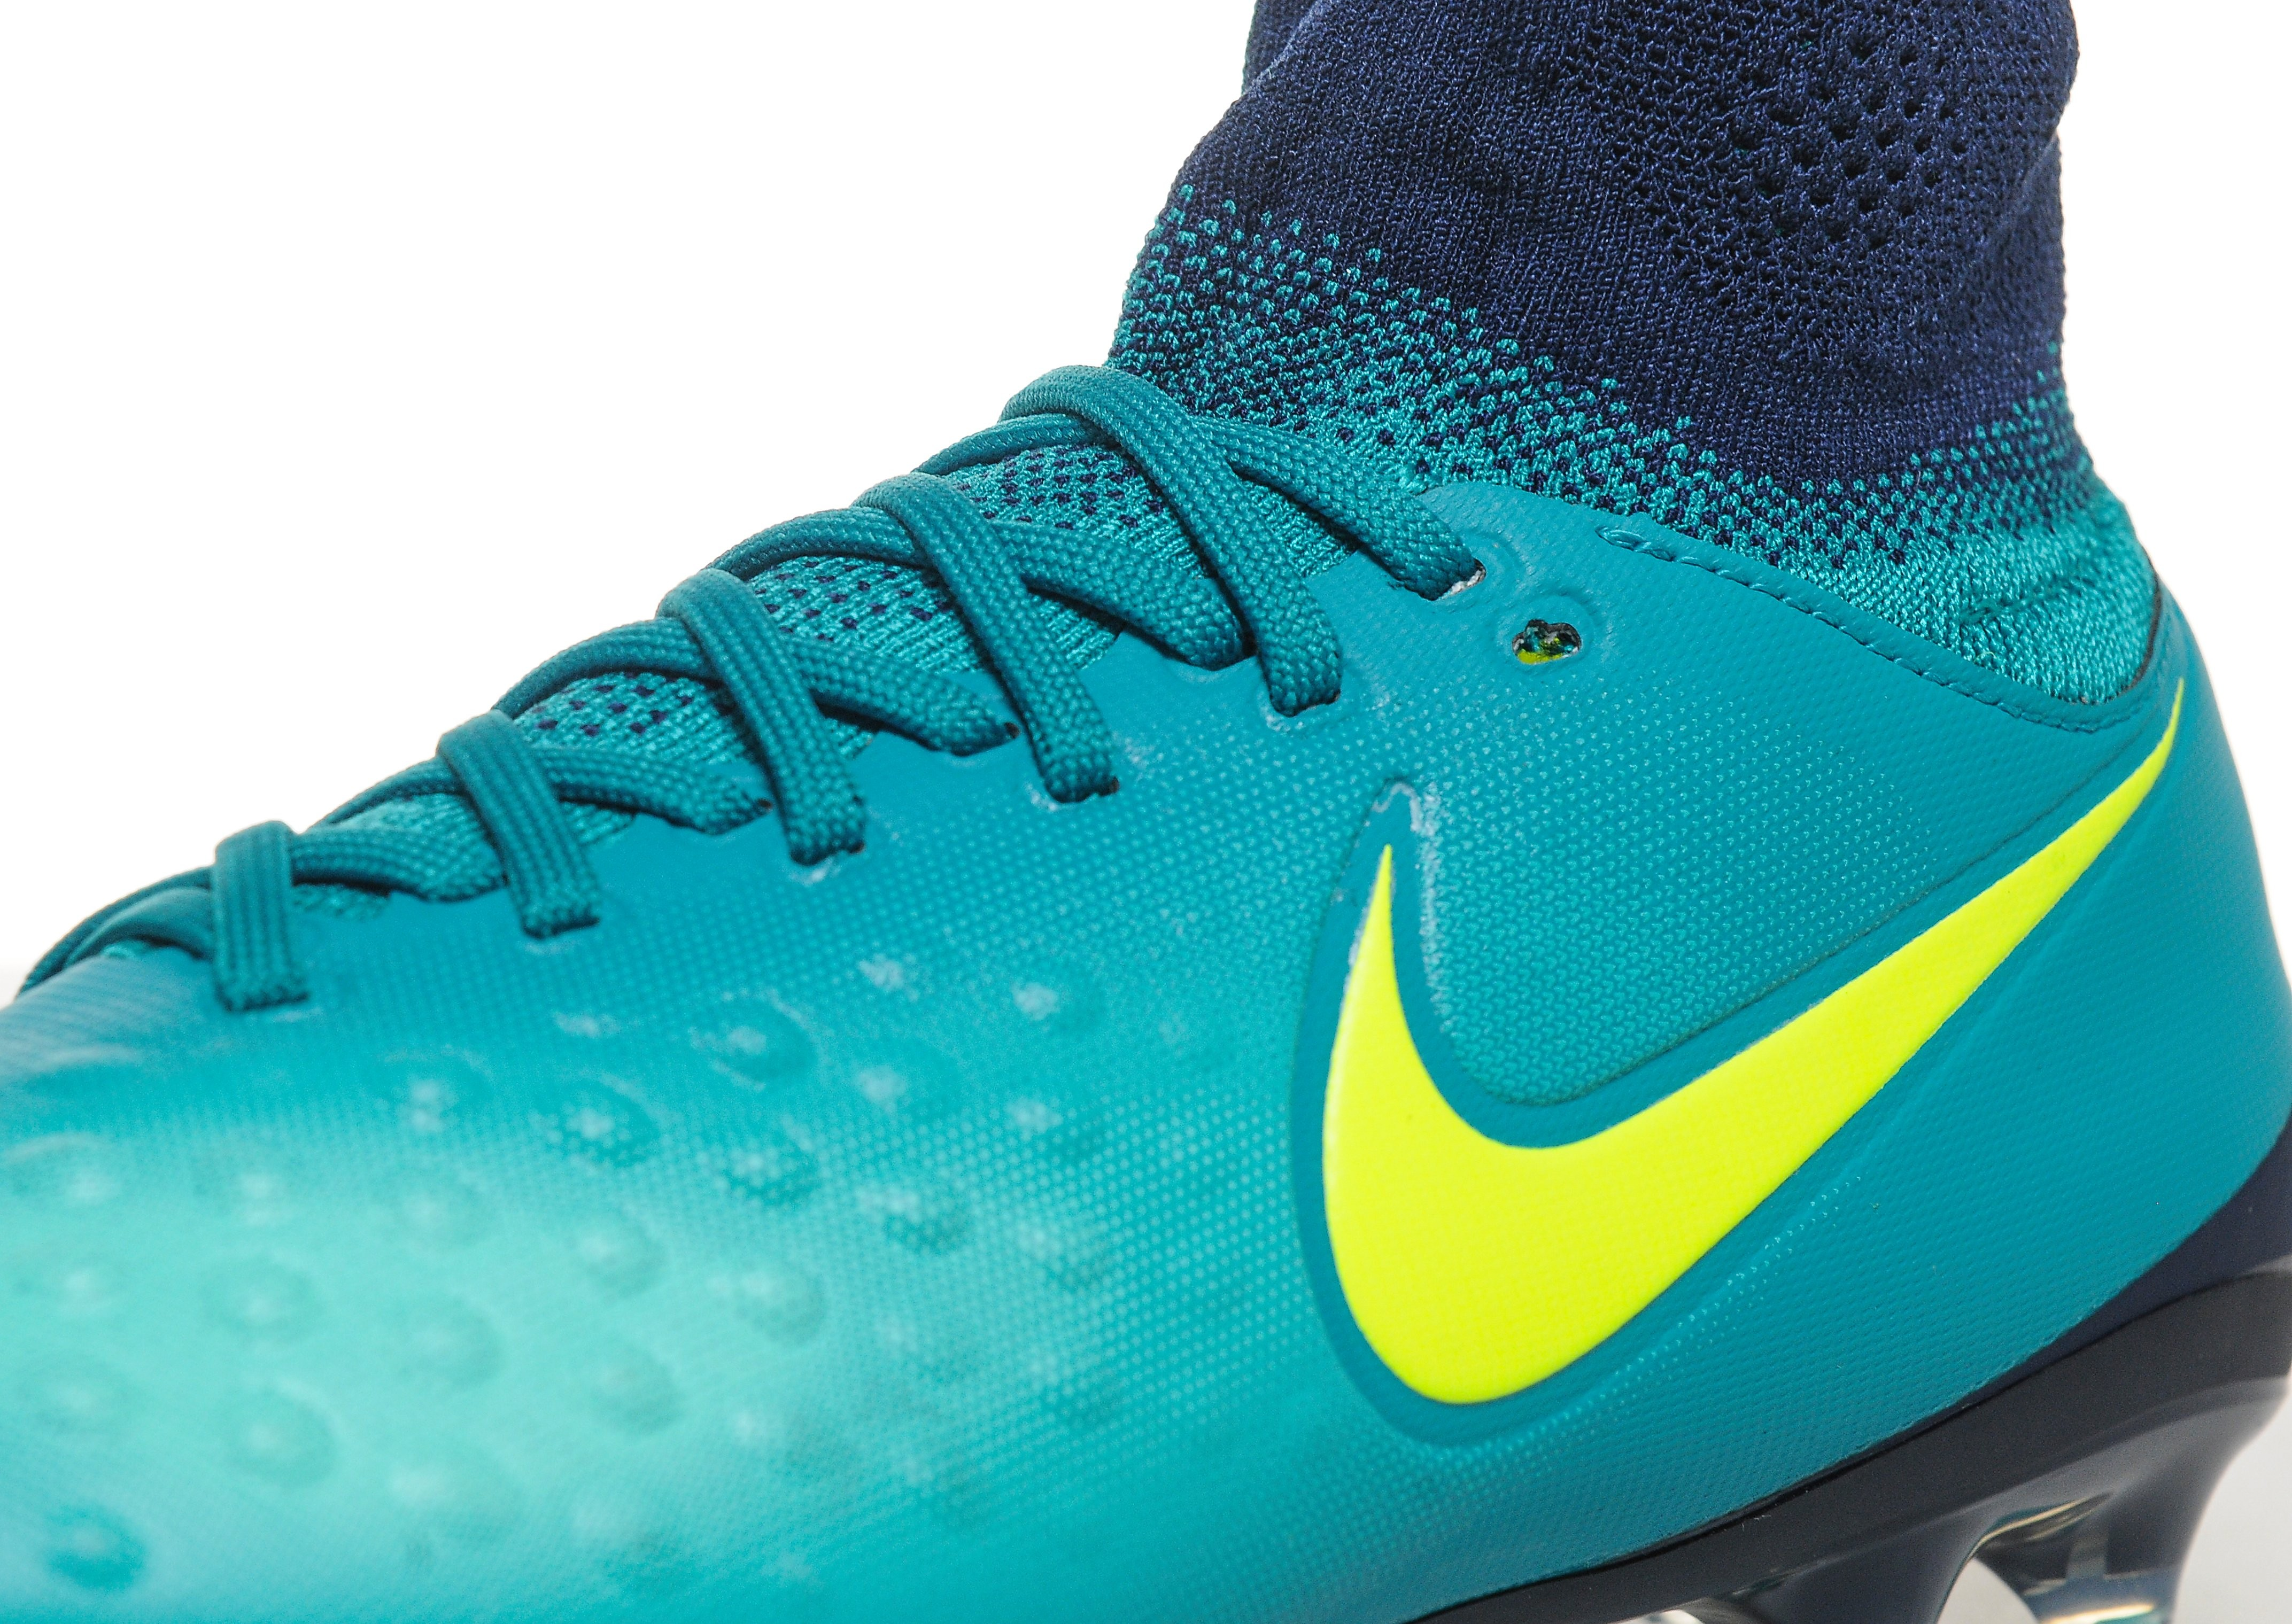 Nike Floodlight Magista Obra II FG bambino